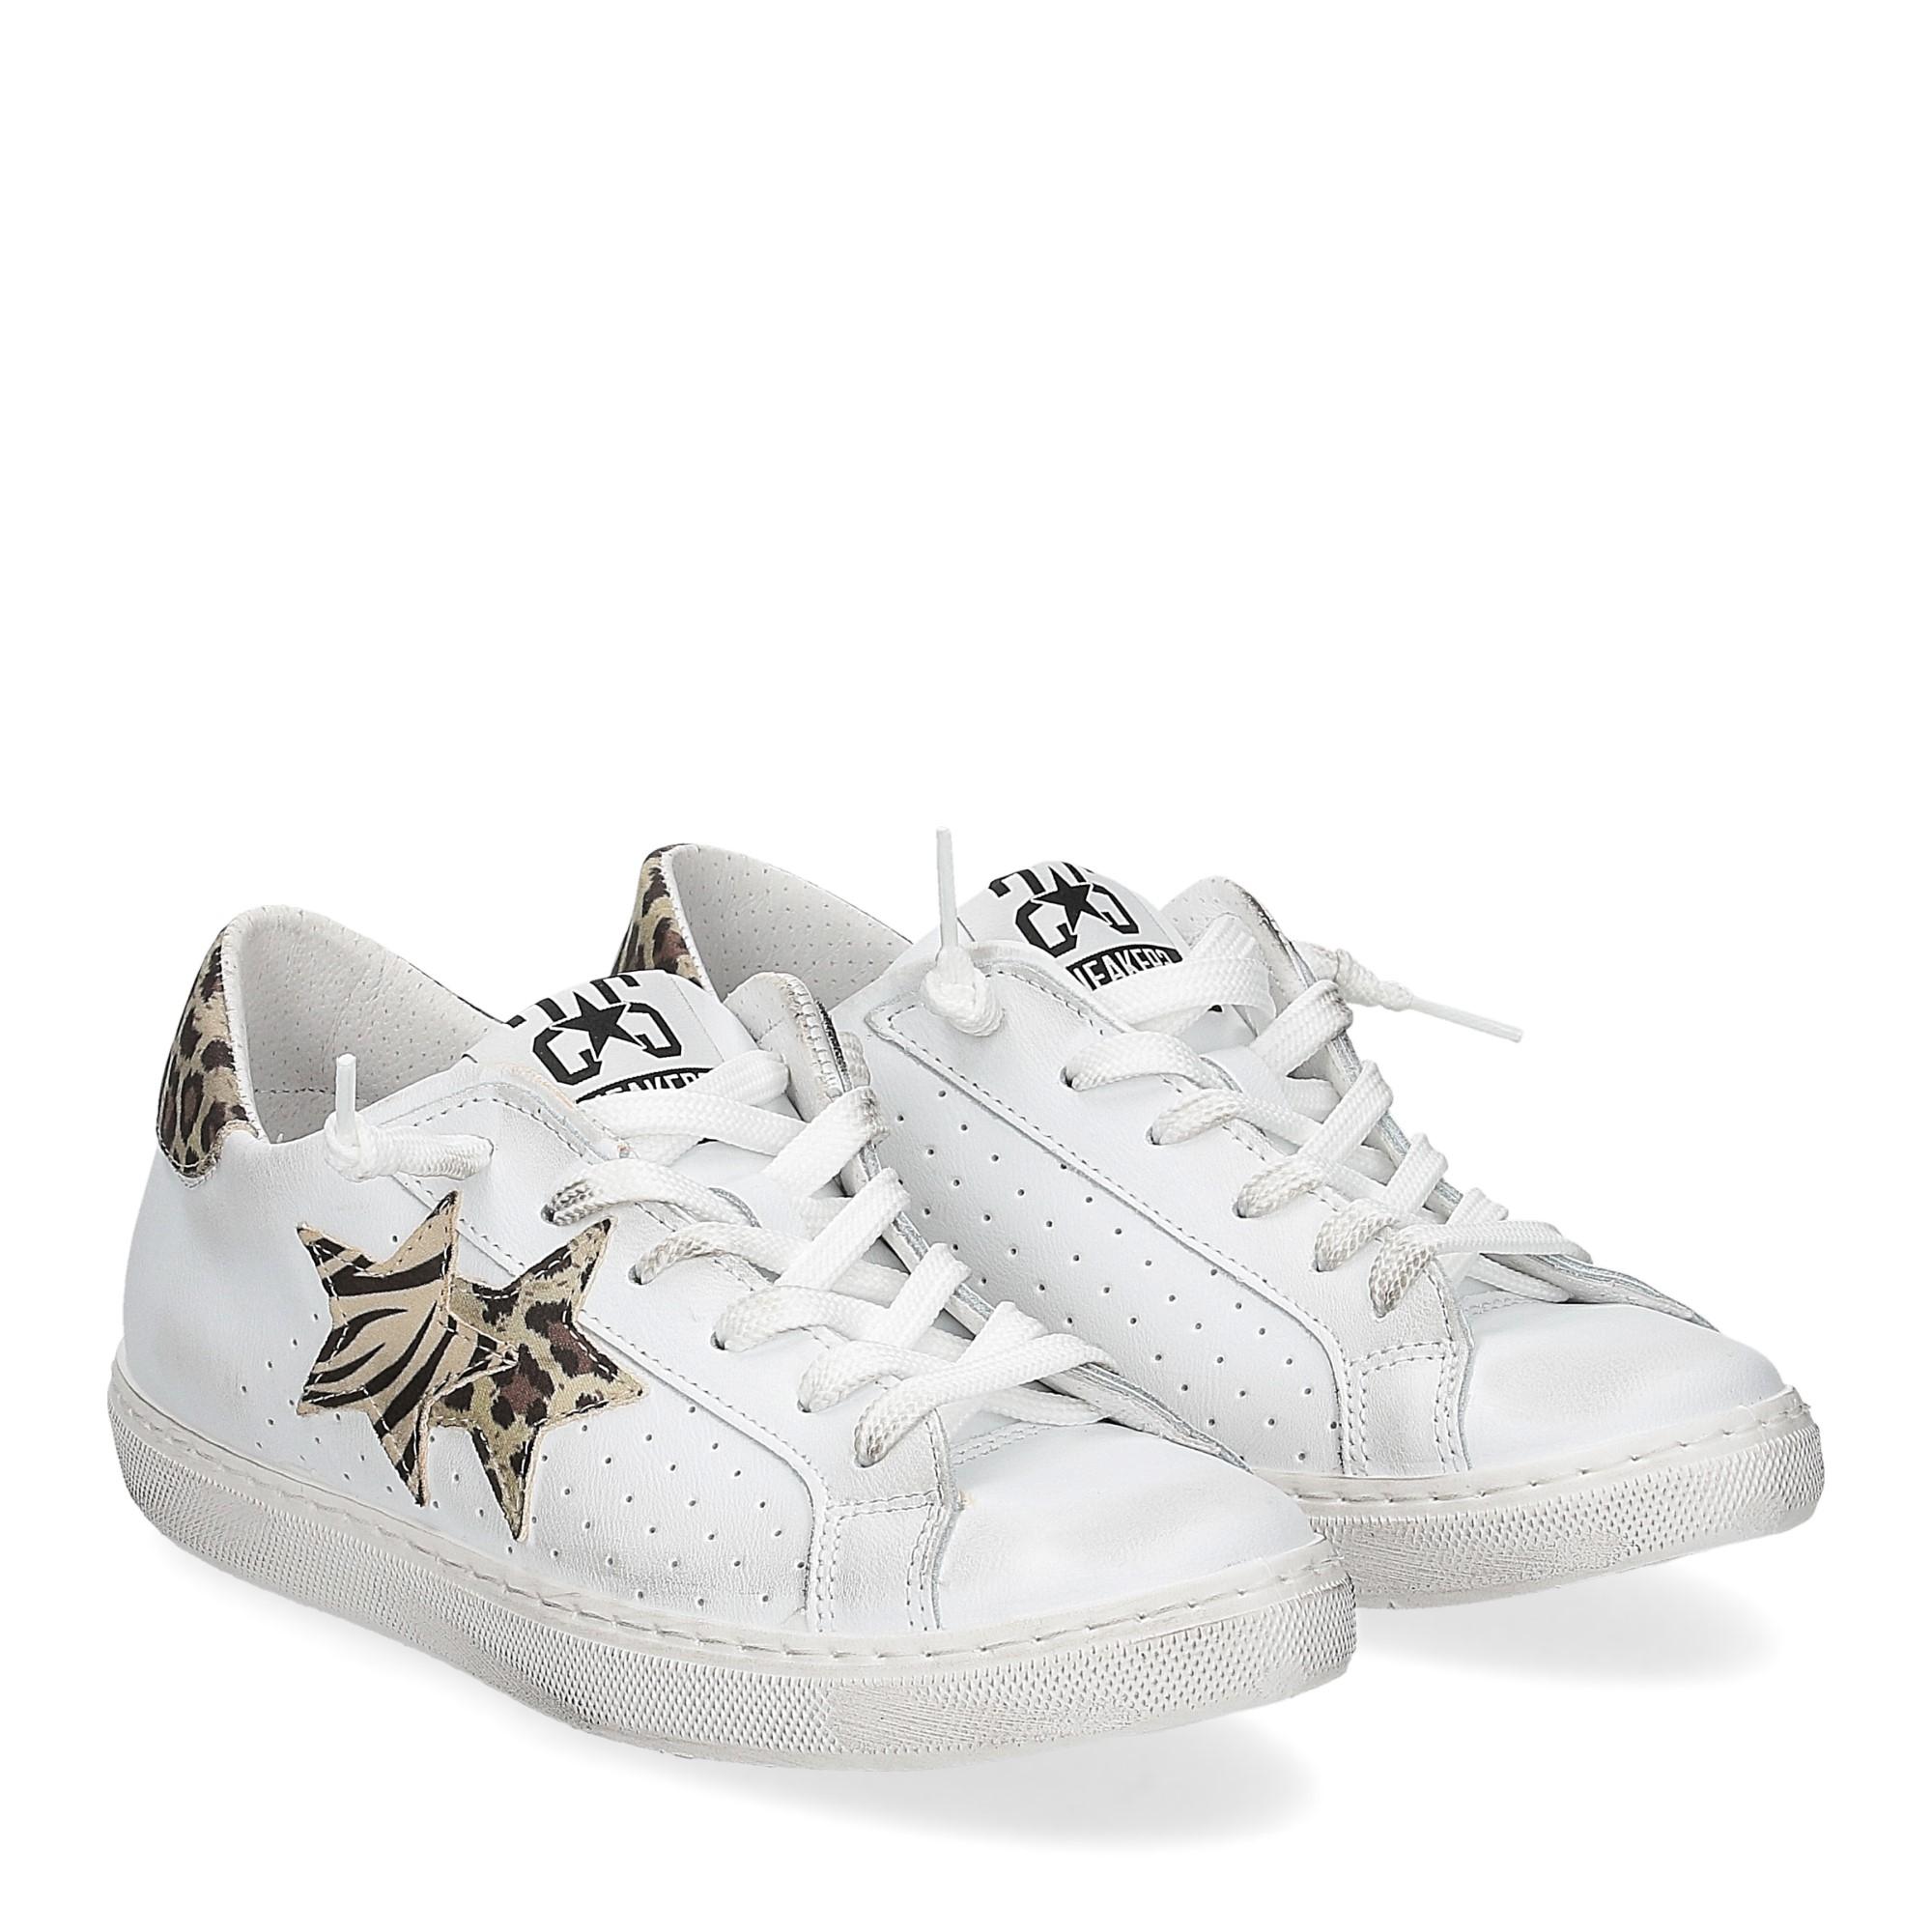 2Star 2622 sneaker low bianco maculato beige